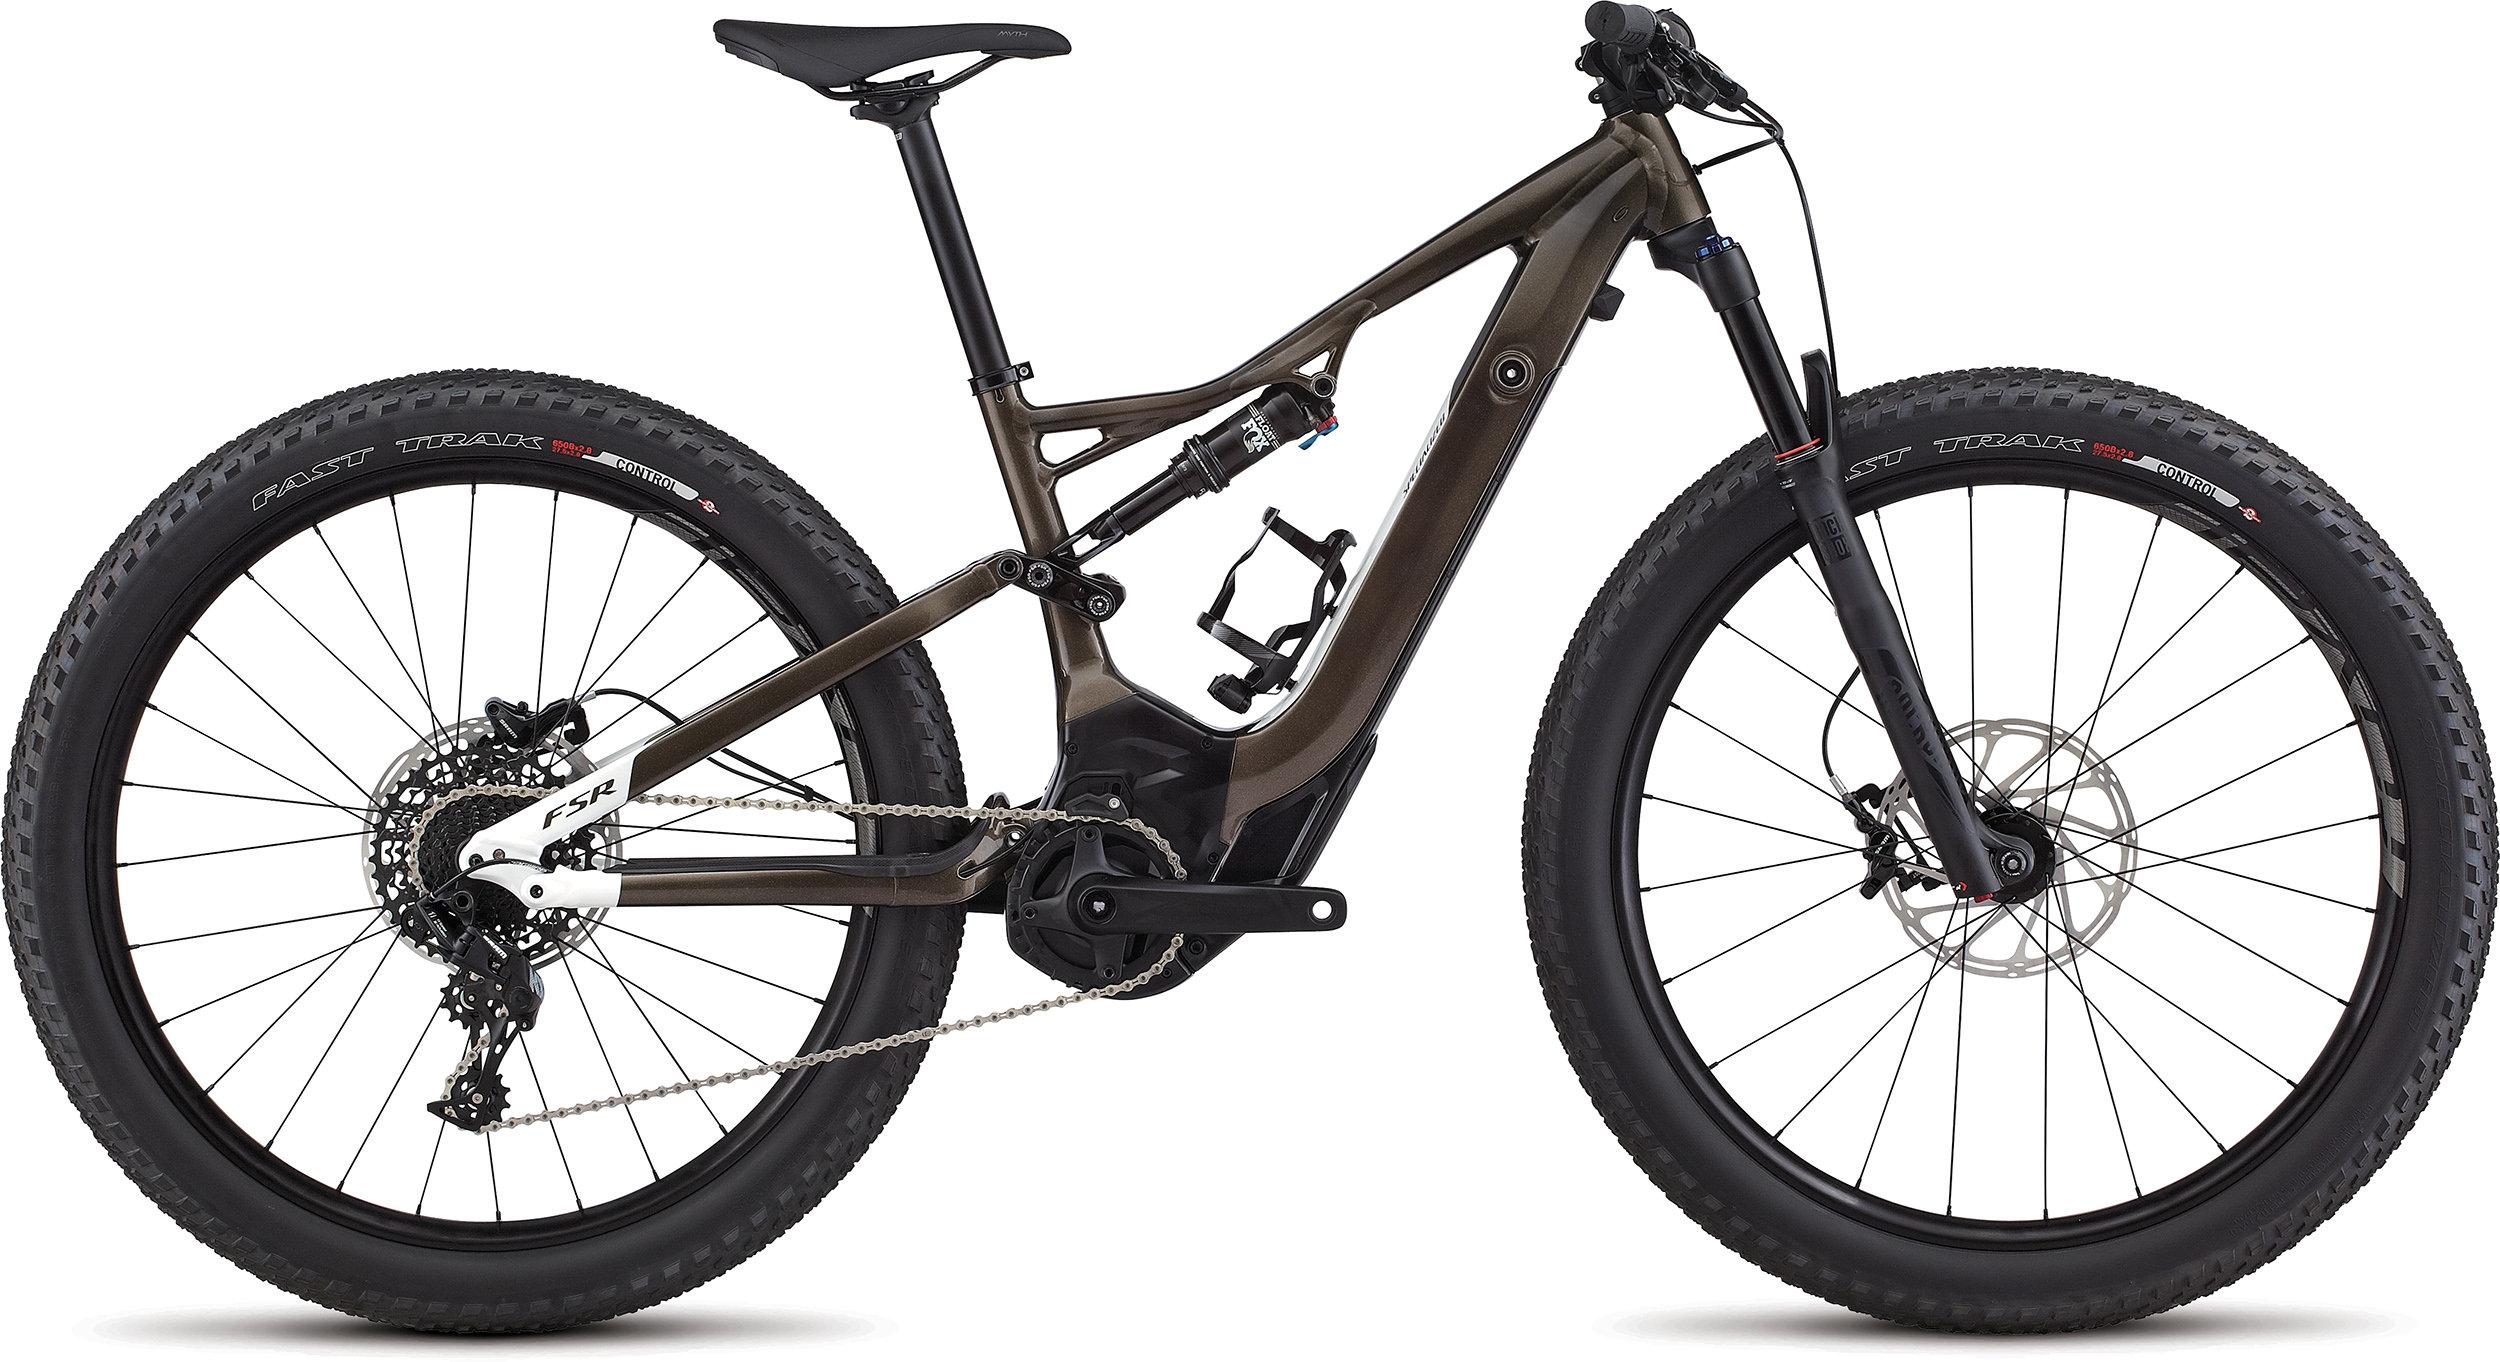 SPECIALIZED LEVO WMN FSR ST 6FATTIE CE RFBLKTNT/METWHTSIL L - Alpha Bikes